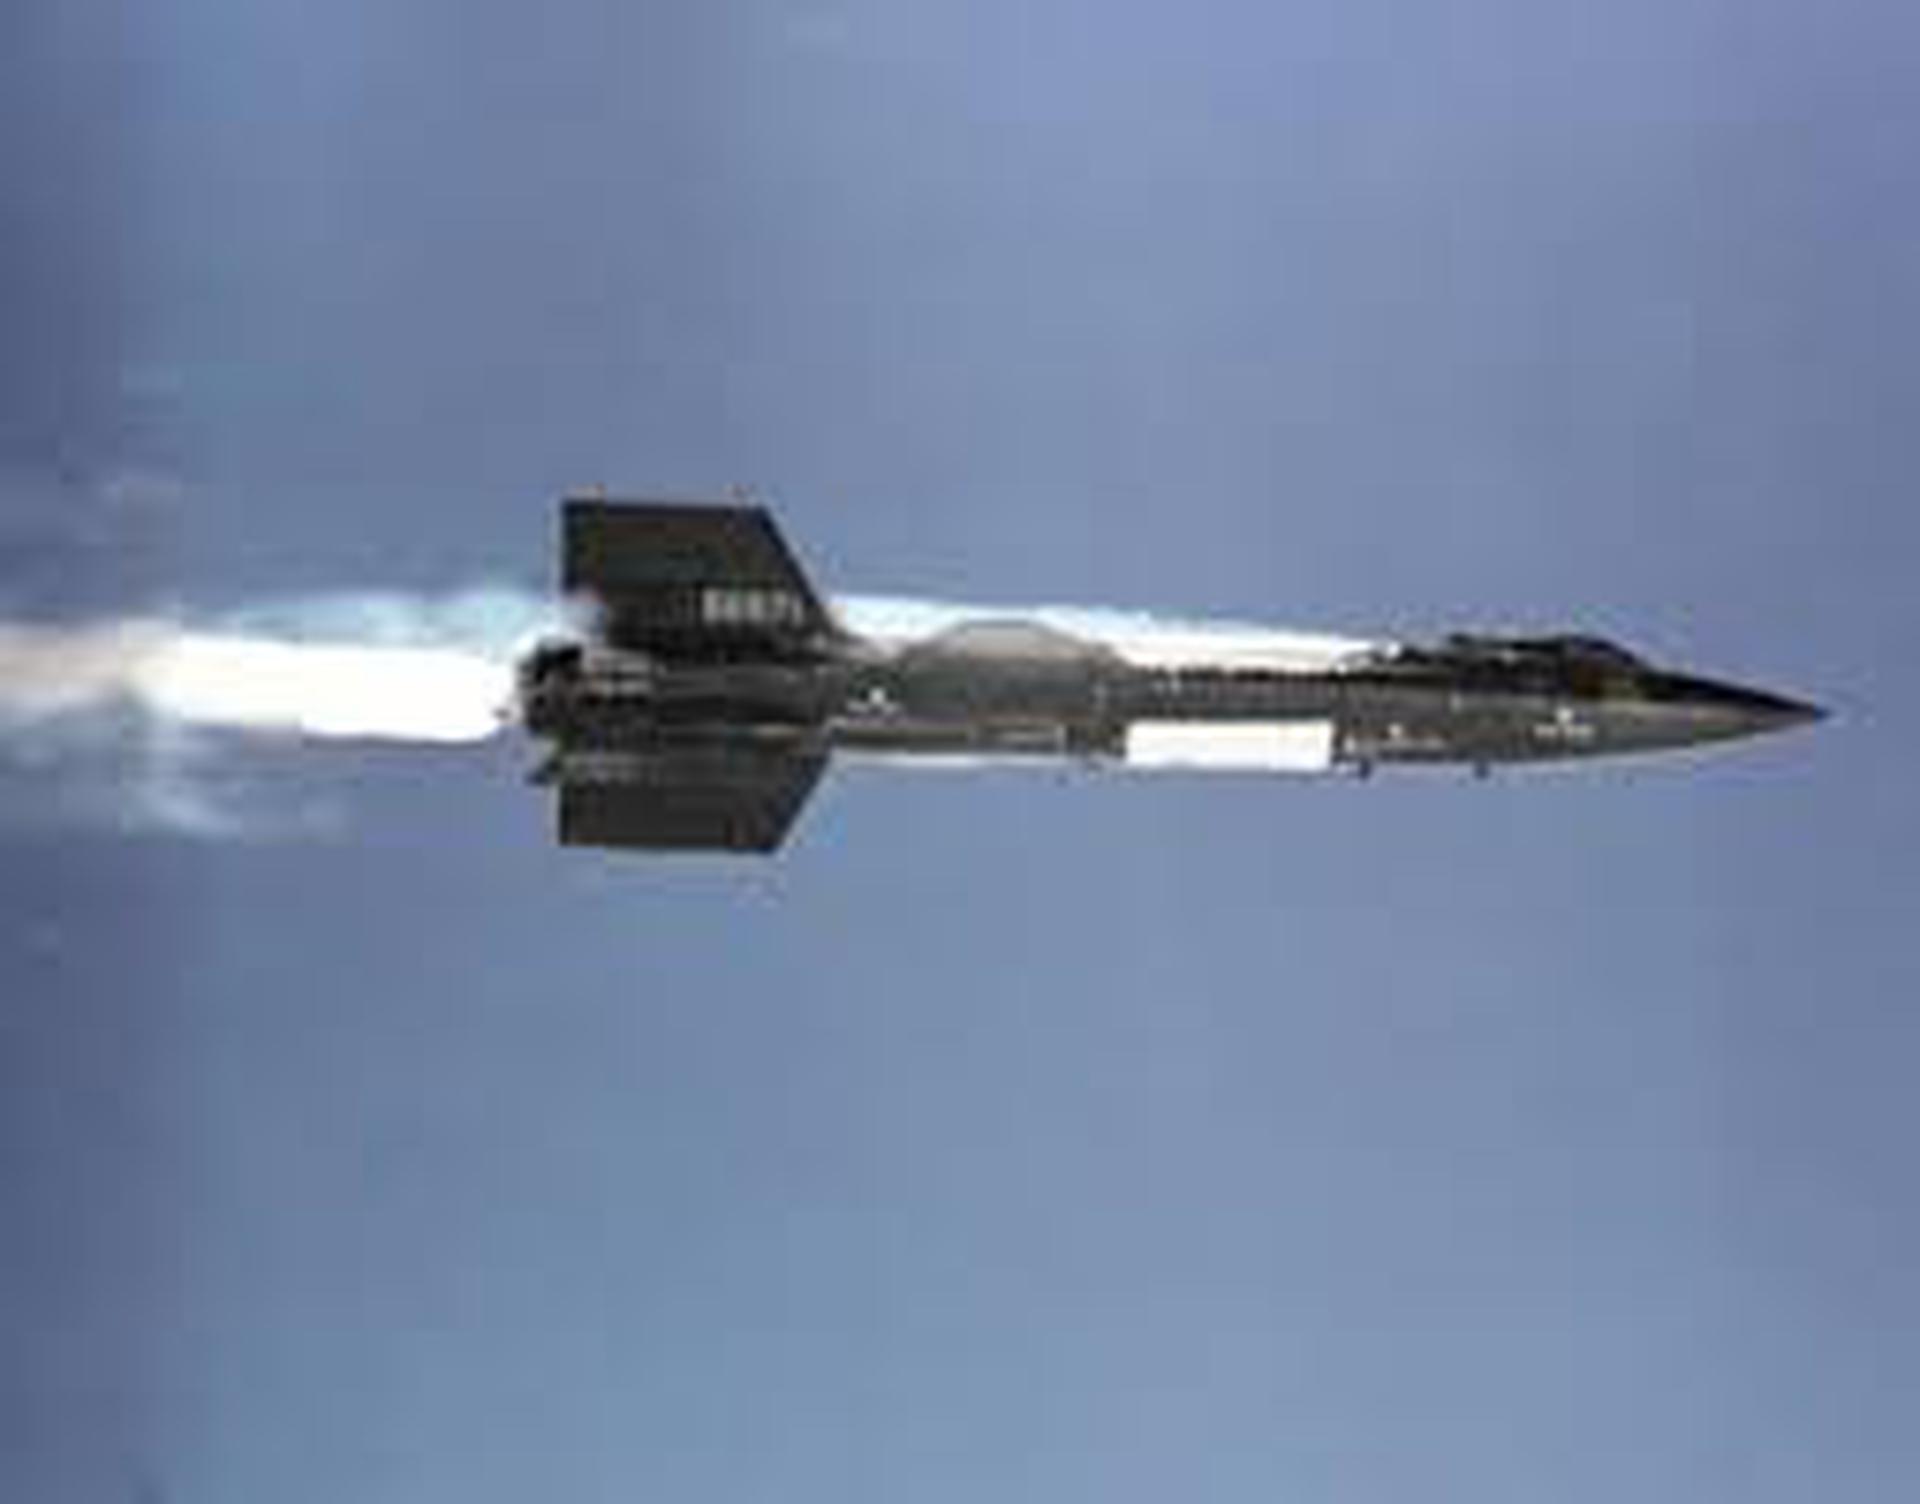 Image of North American X-15